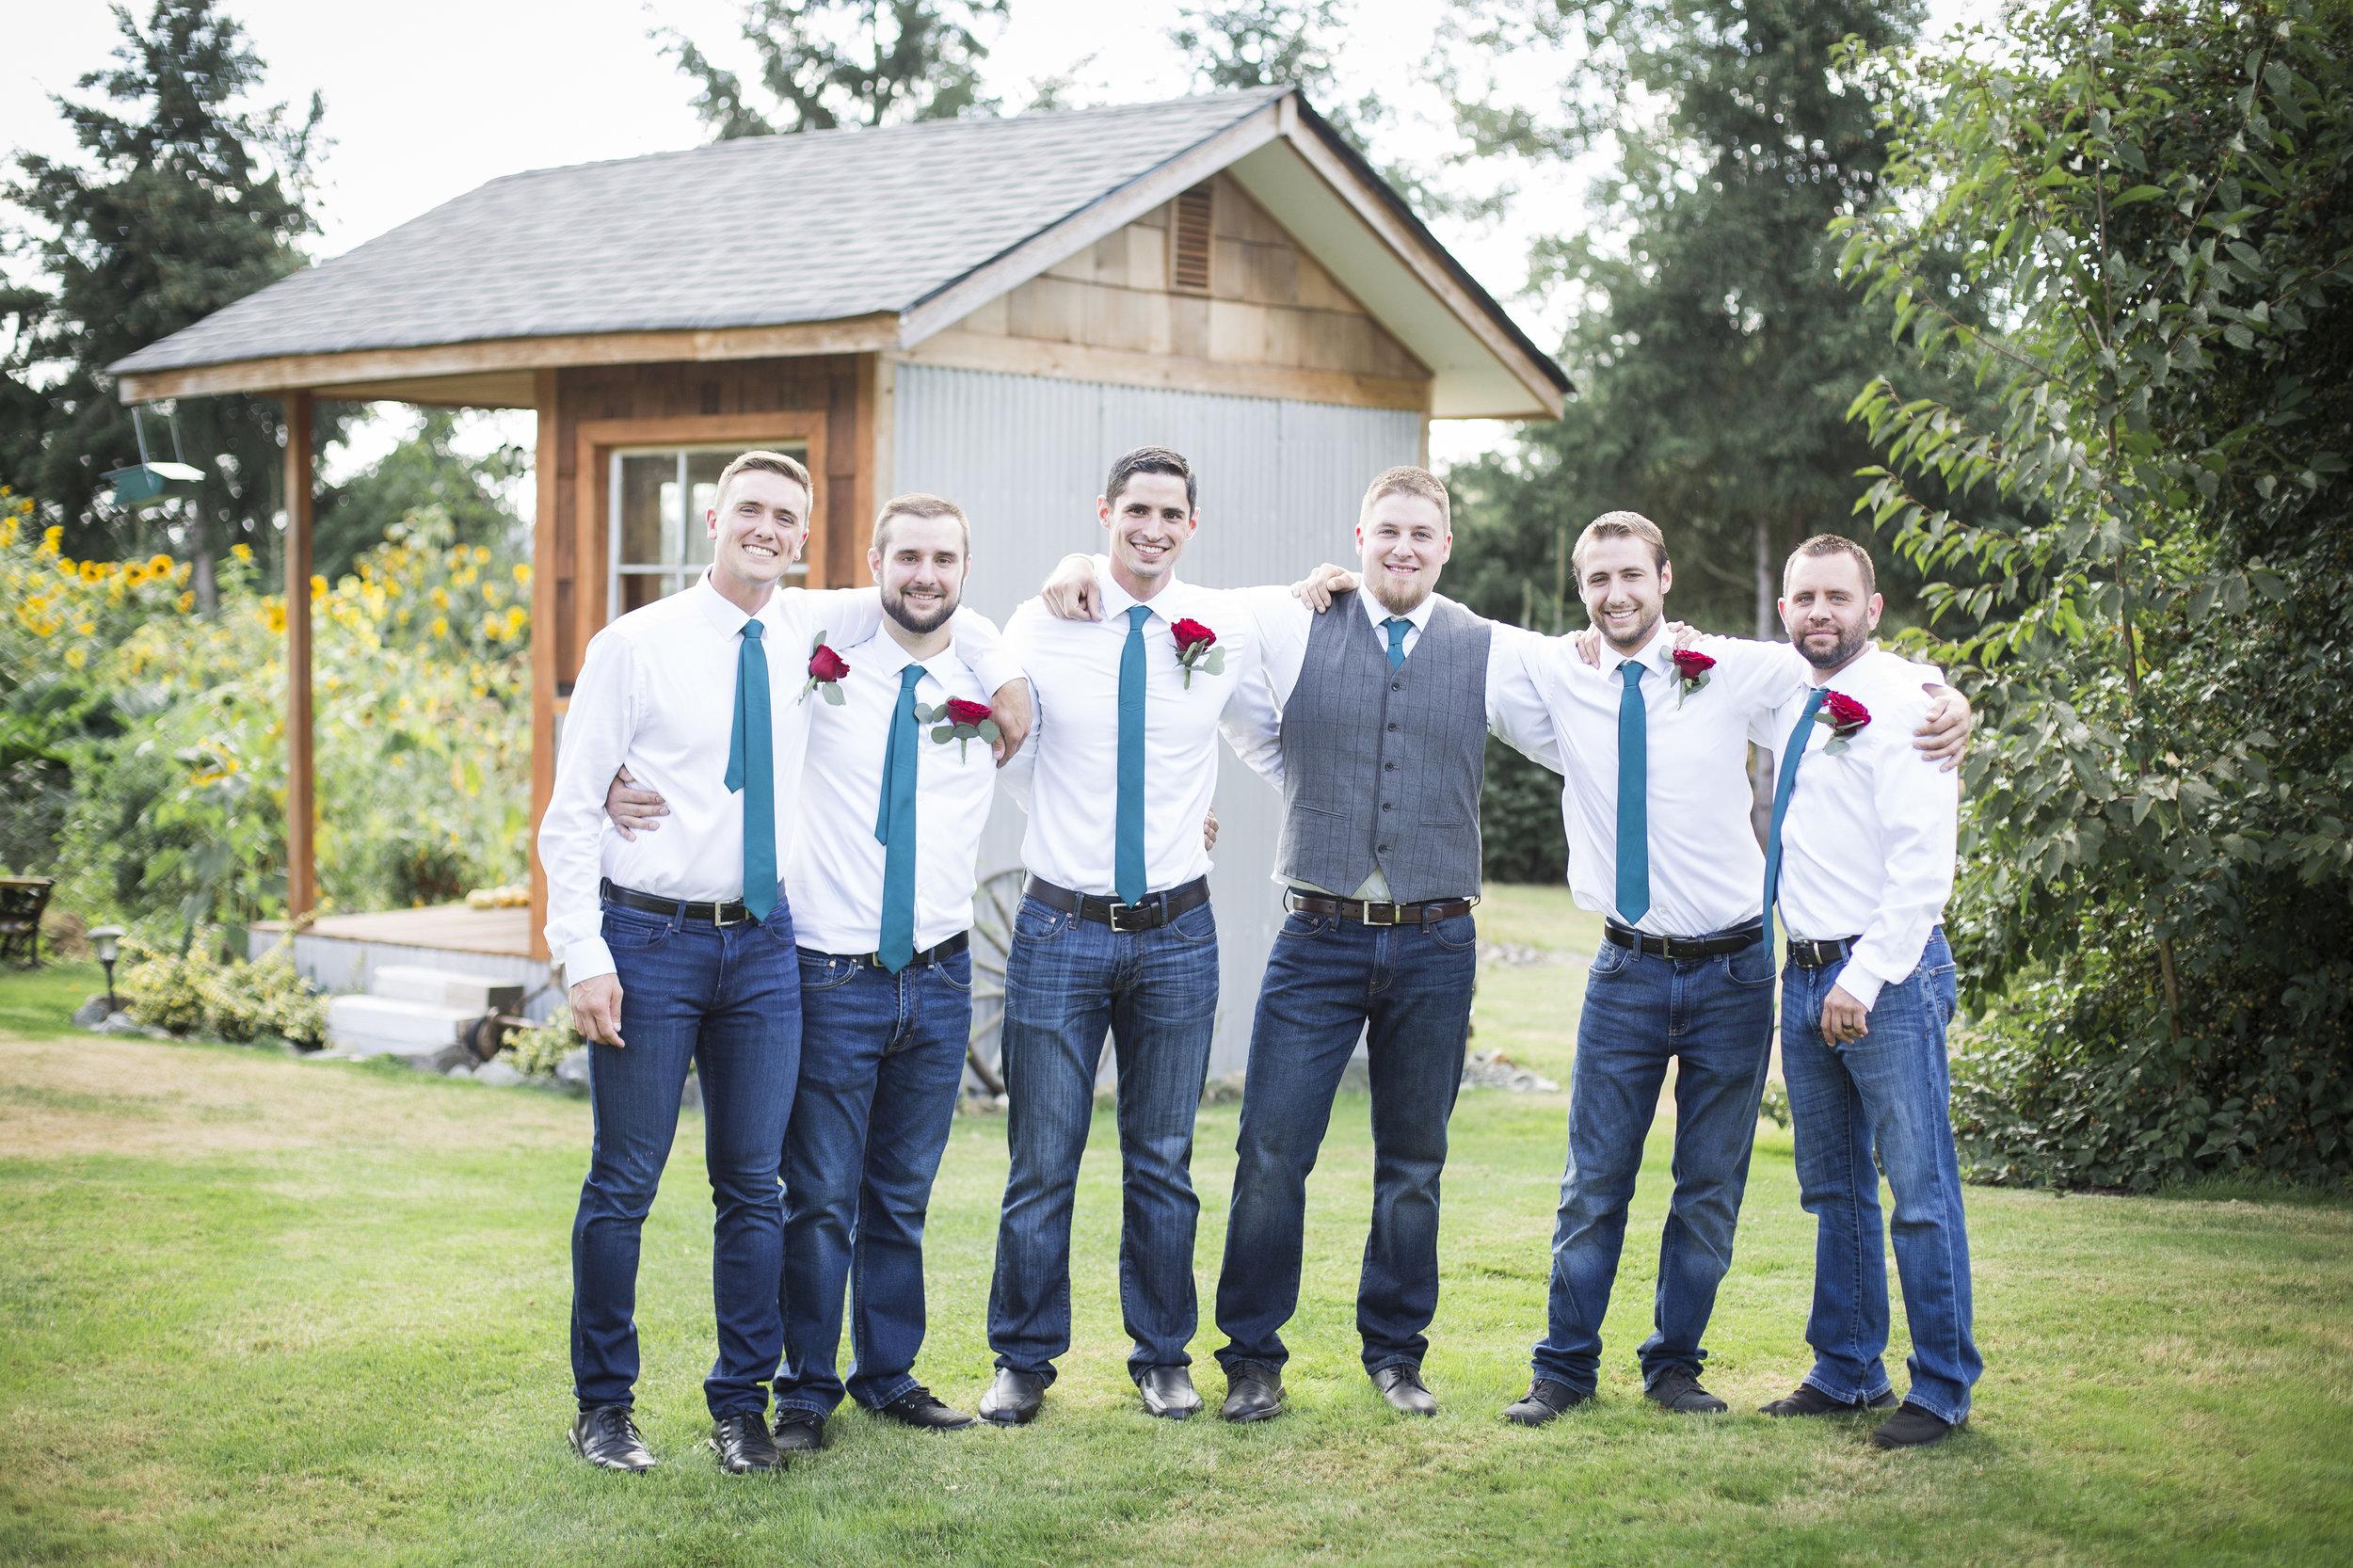 Seattle-Tacoma-Wedding-Photographer-Jaeda-Reed-Fall-Glenwood-Tree-Farm-09.jpg